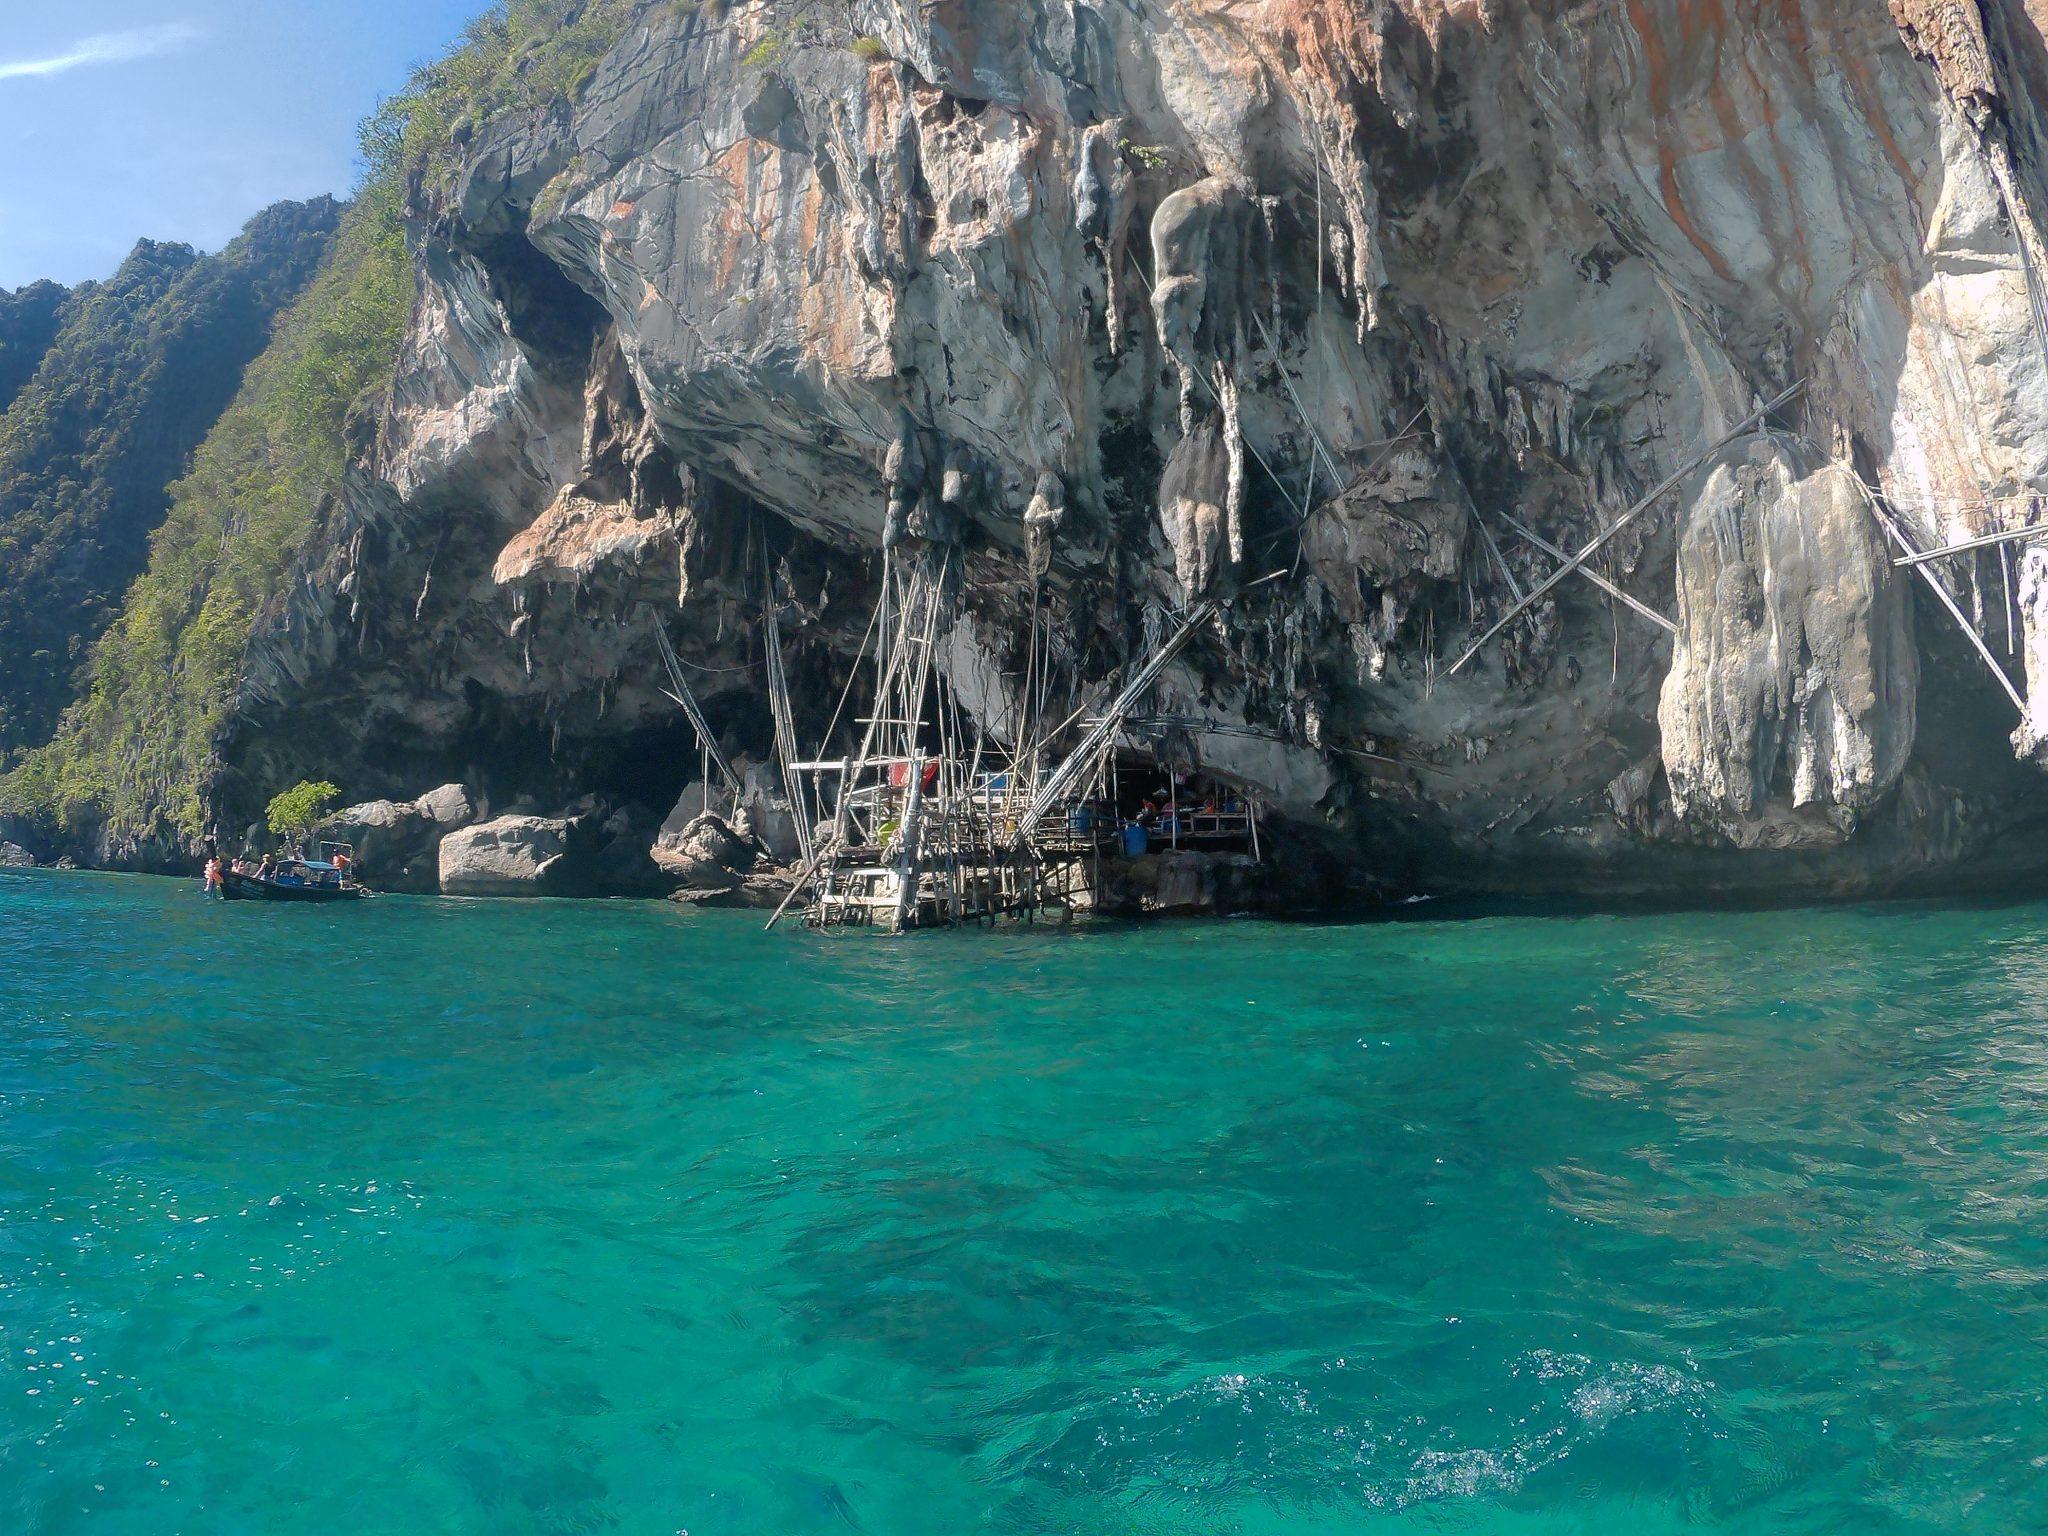 Img post Phuket o Krabi. Viking Cave en Phi Phi - Pasaporte y Millas